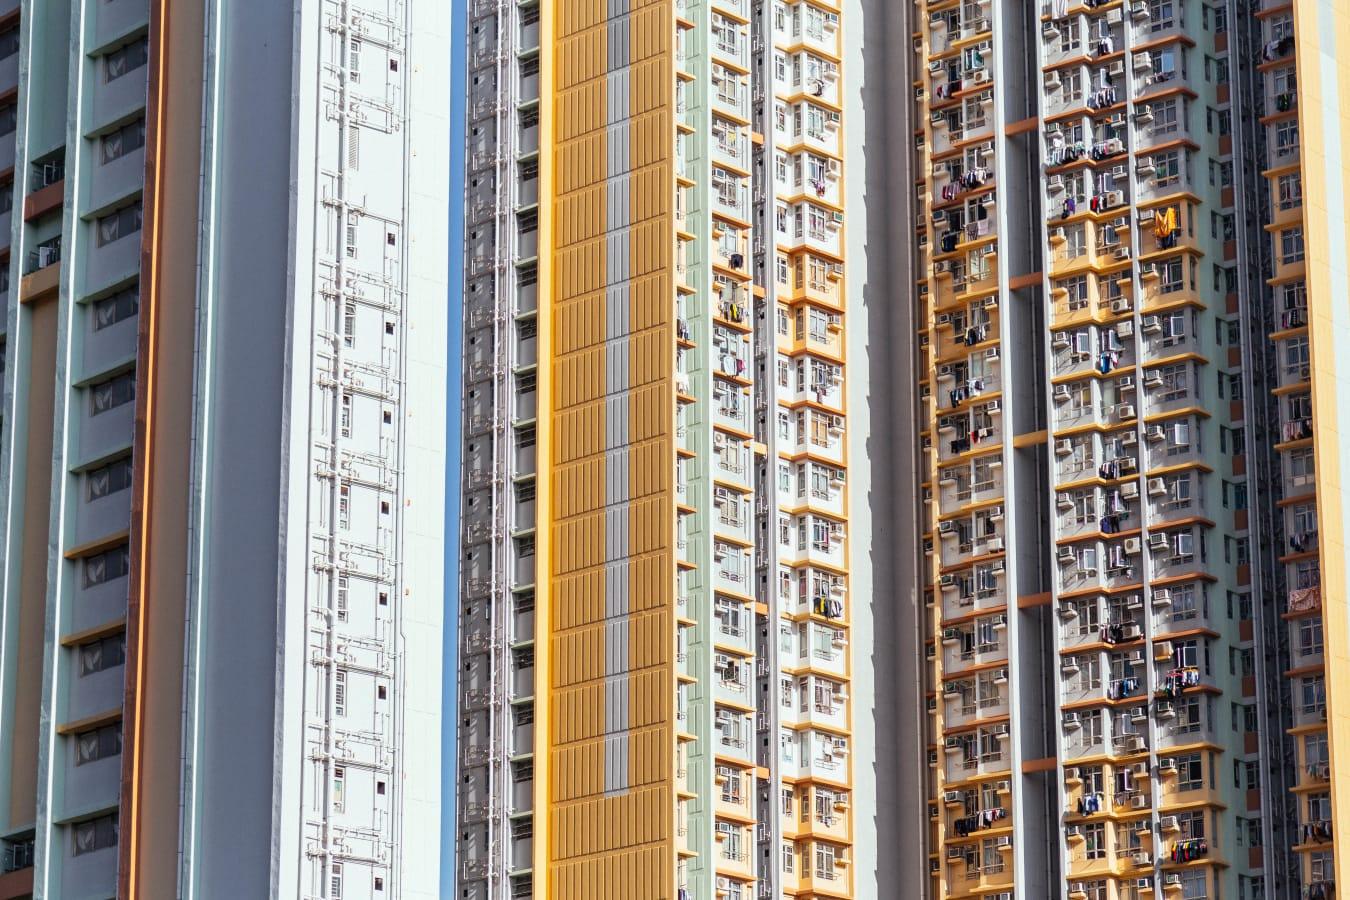 Tempel der 10.000 Buddhas & New Territories - Tagesausflug in Hong Kong